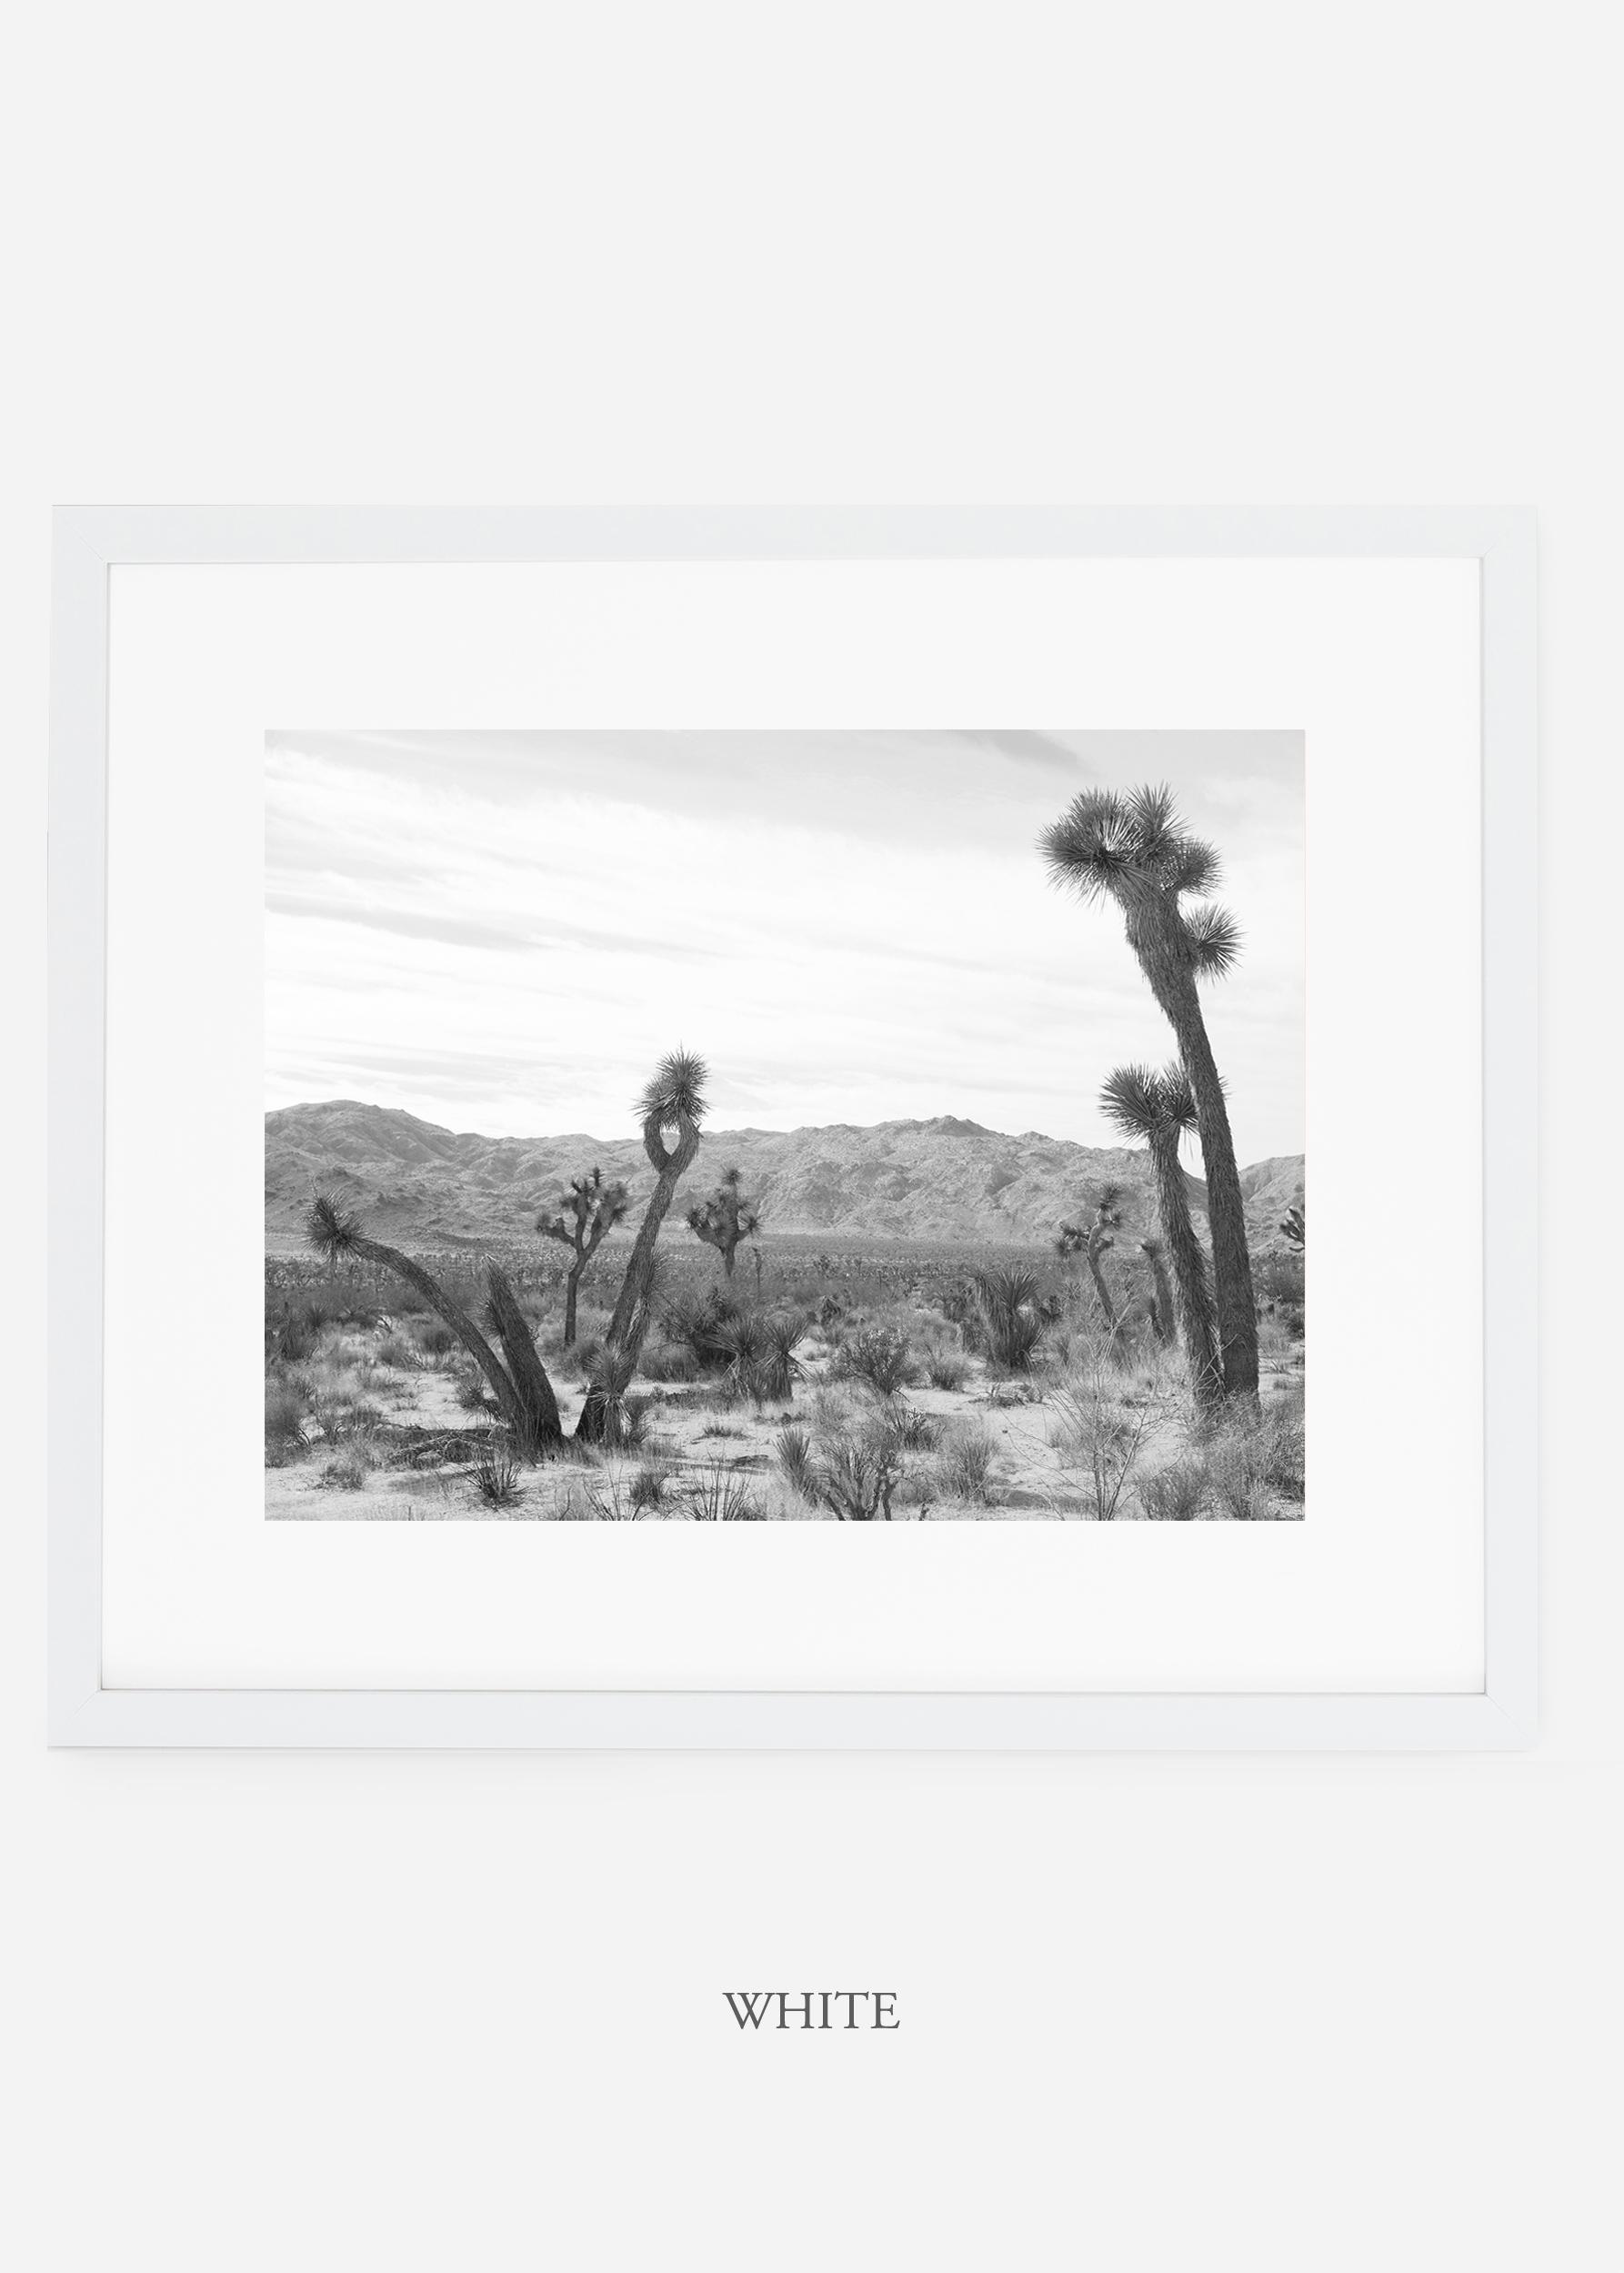 WilderCalifornia_whiteframe_JoshuaTree_No.4_interiordesign_cactusprint_art.jpg